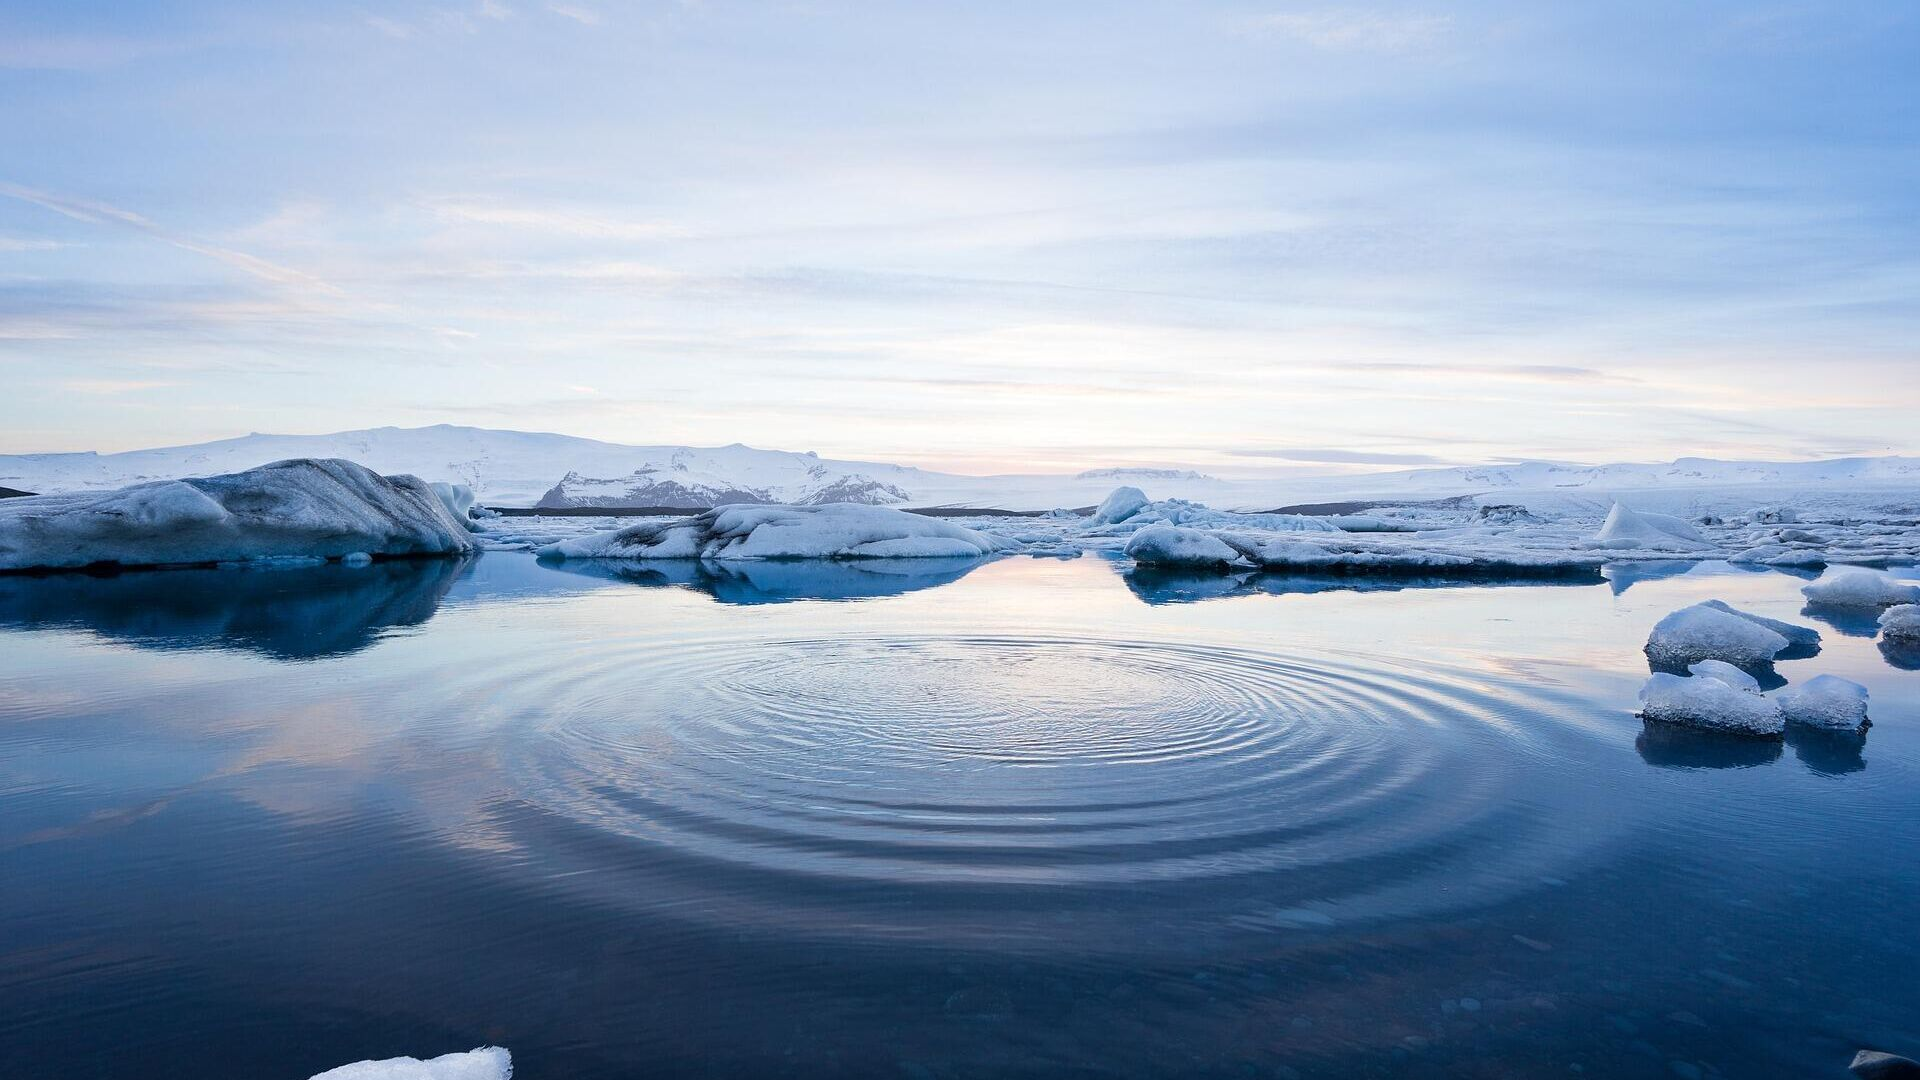 Arktis (Symbolbild) - SNA, 1920, 22.09.2021